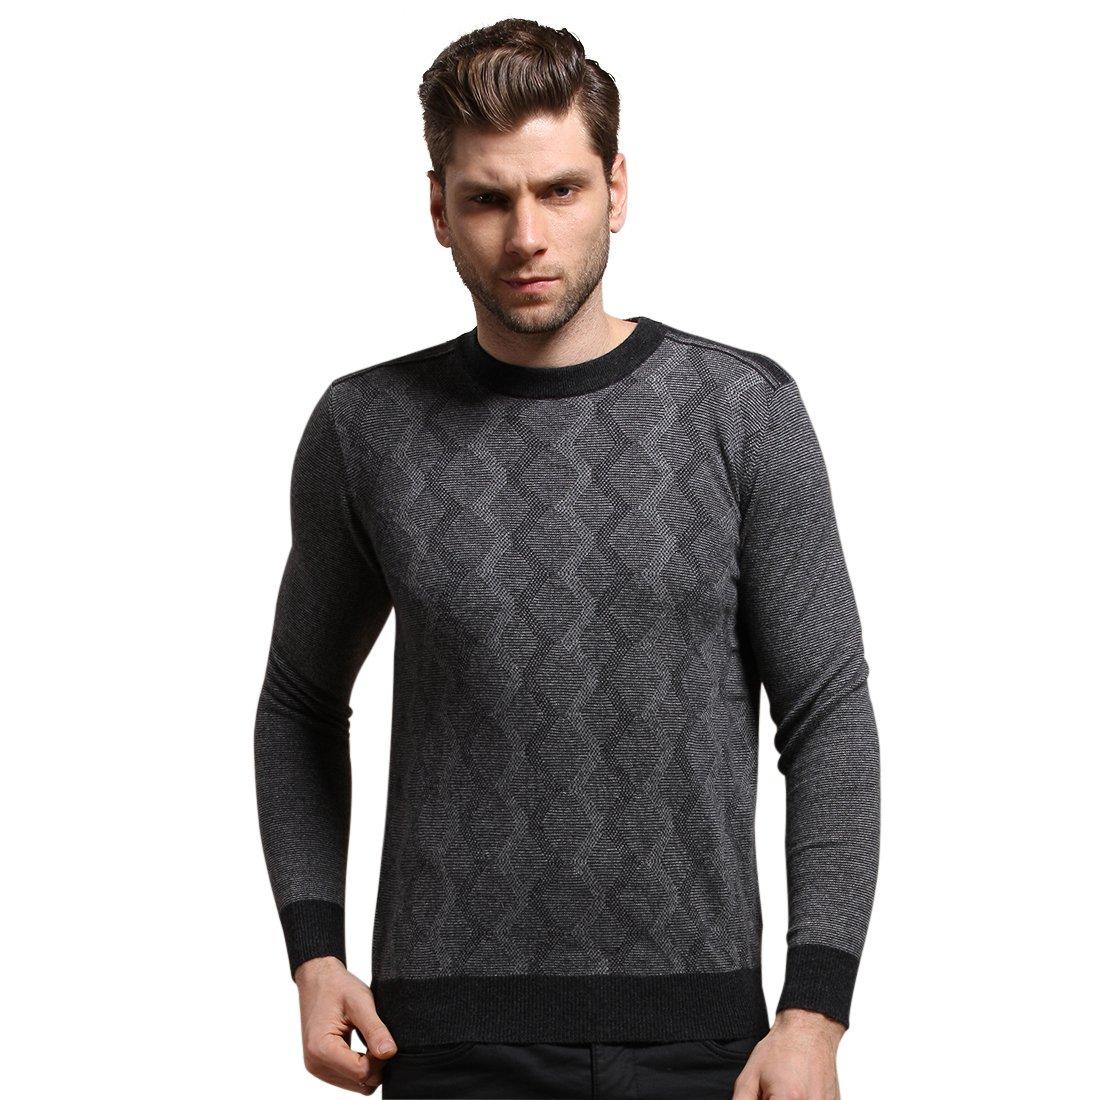 SpringAir Men's 100% Cashmere Sweater Long Sleeve Slim-Fit CrewNeck Pullover